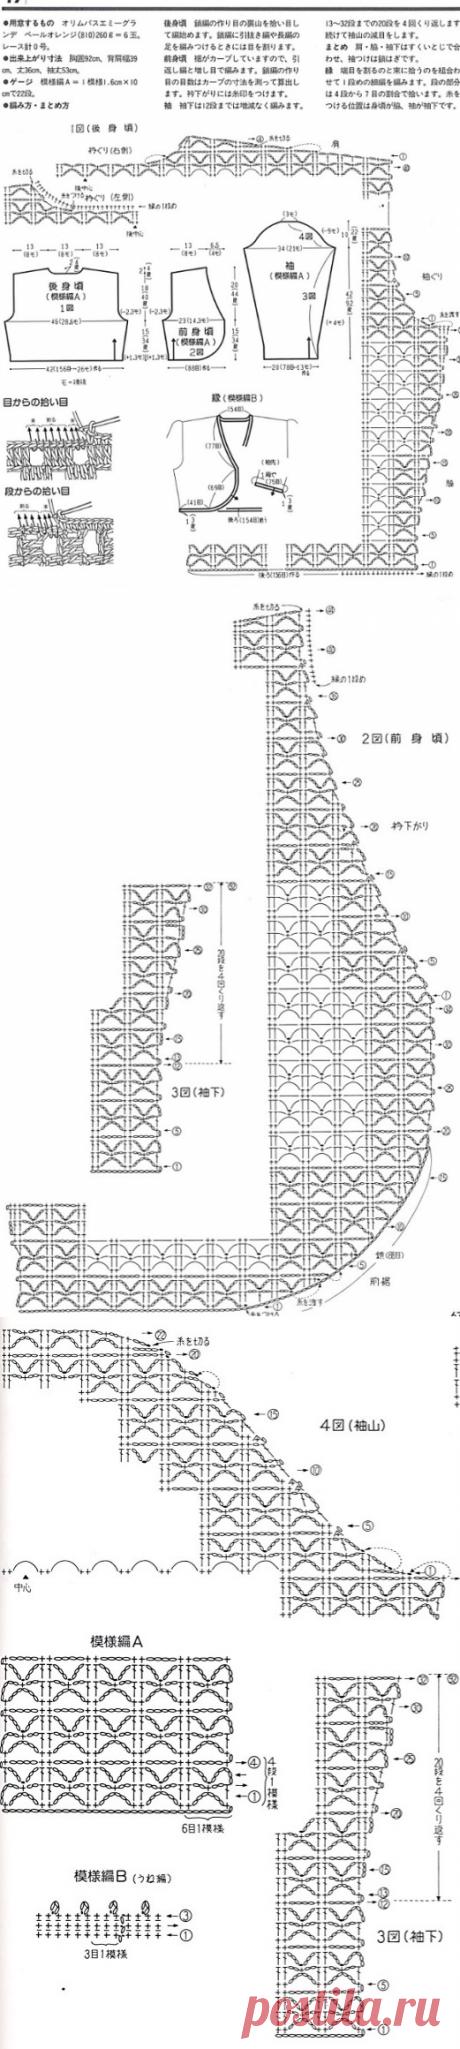 Вязание короткого жакета крючком